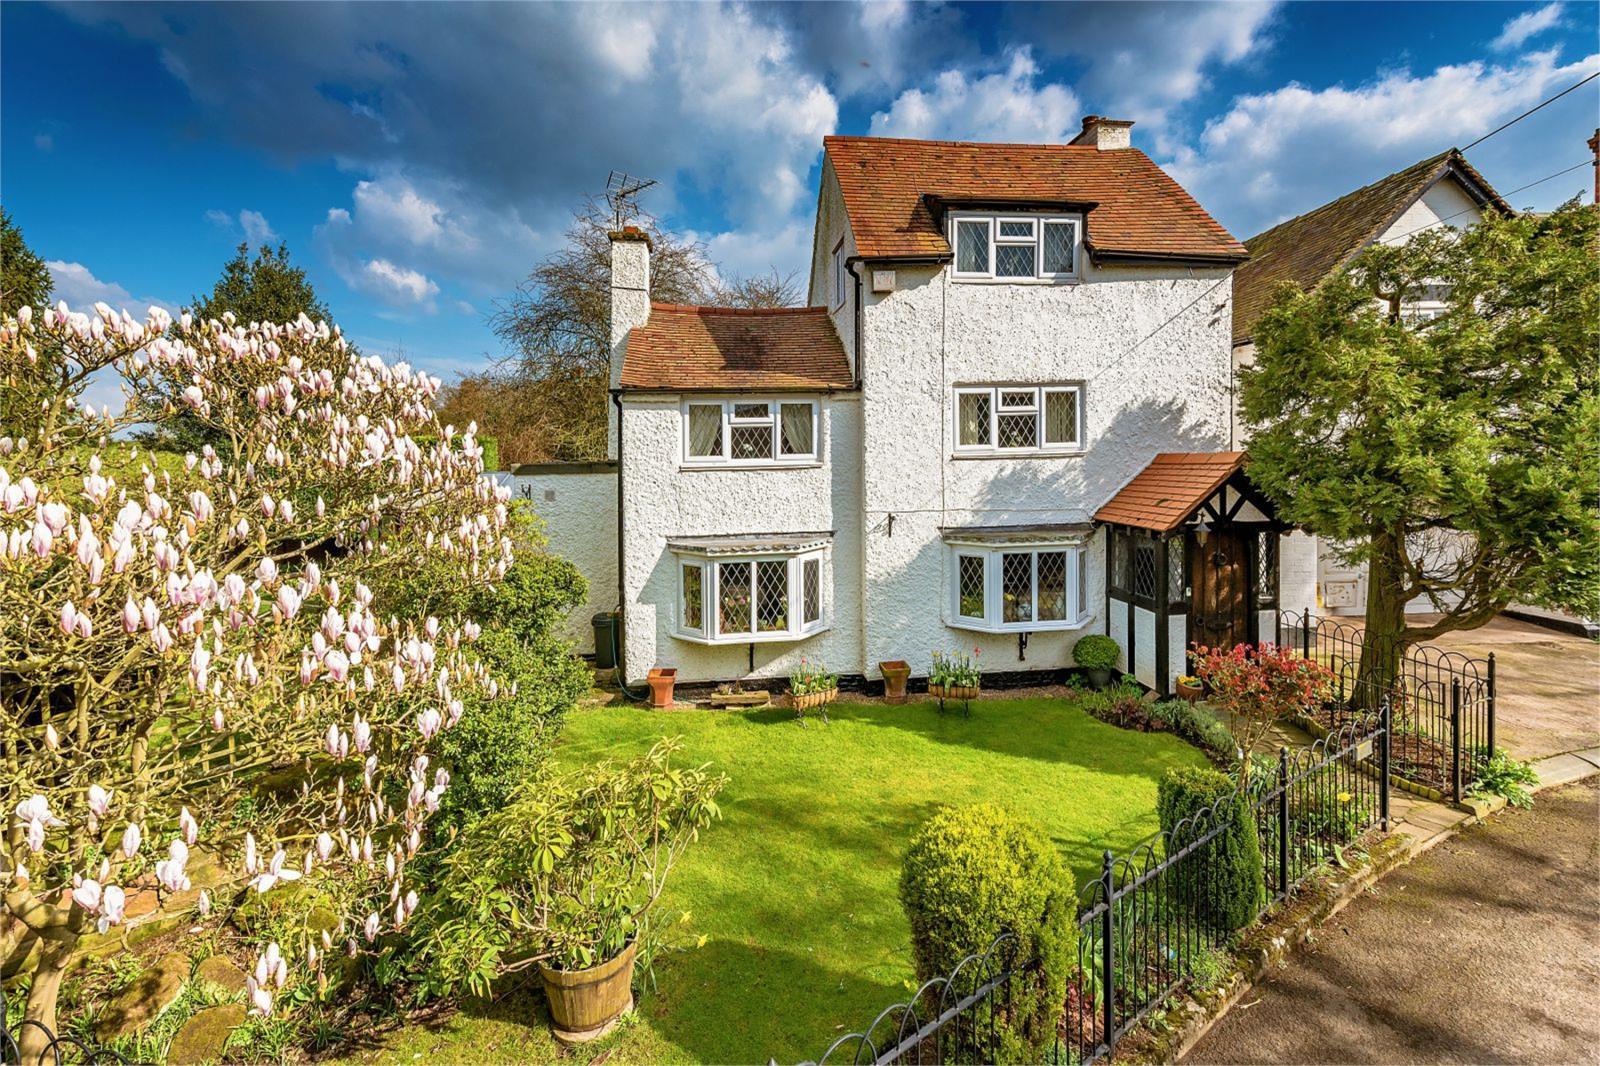 3 Bedrooms Detached House for sale in Kismet, Ryton Road, Beckbury, Shifnal, Shropshire, TF11